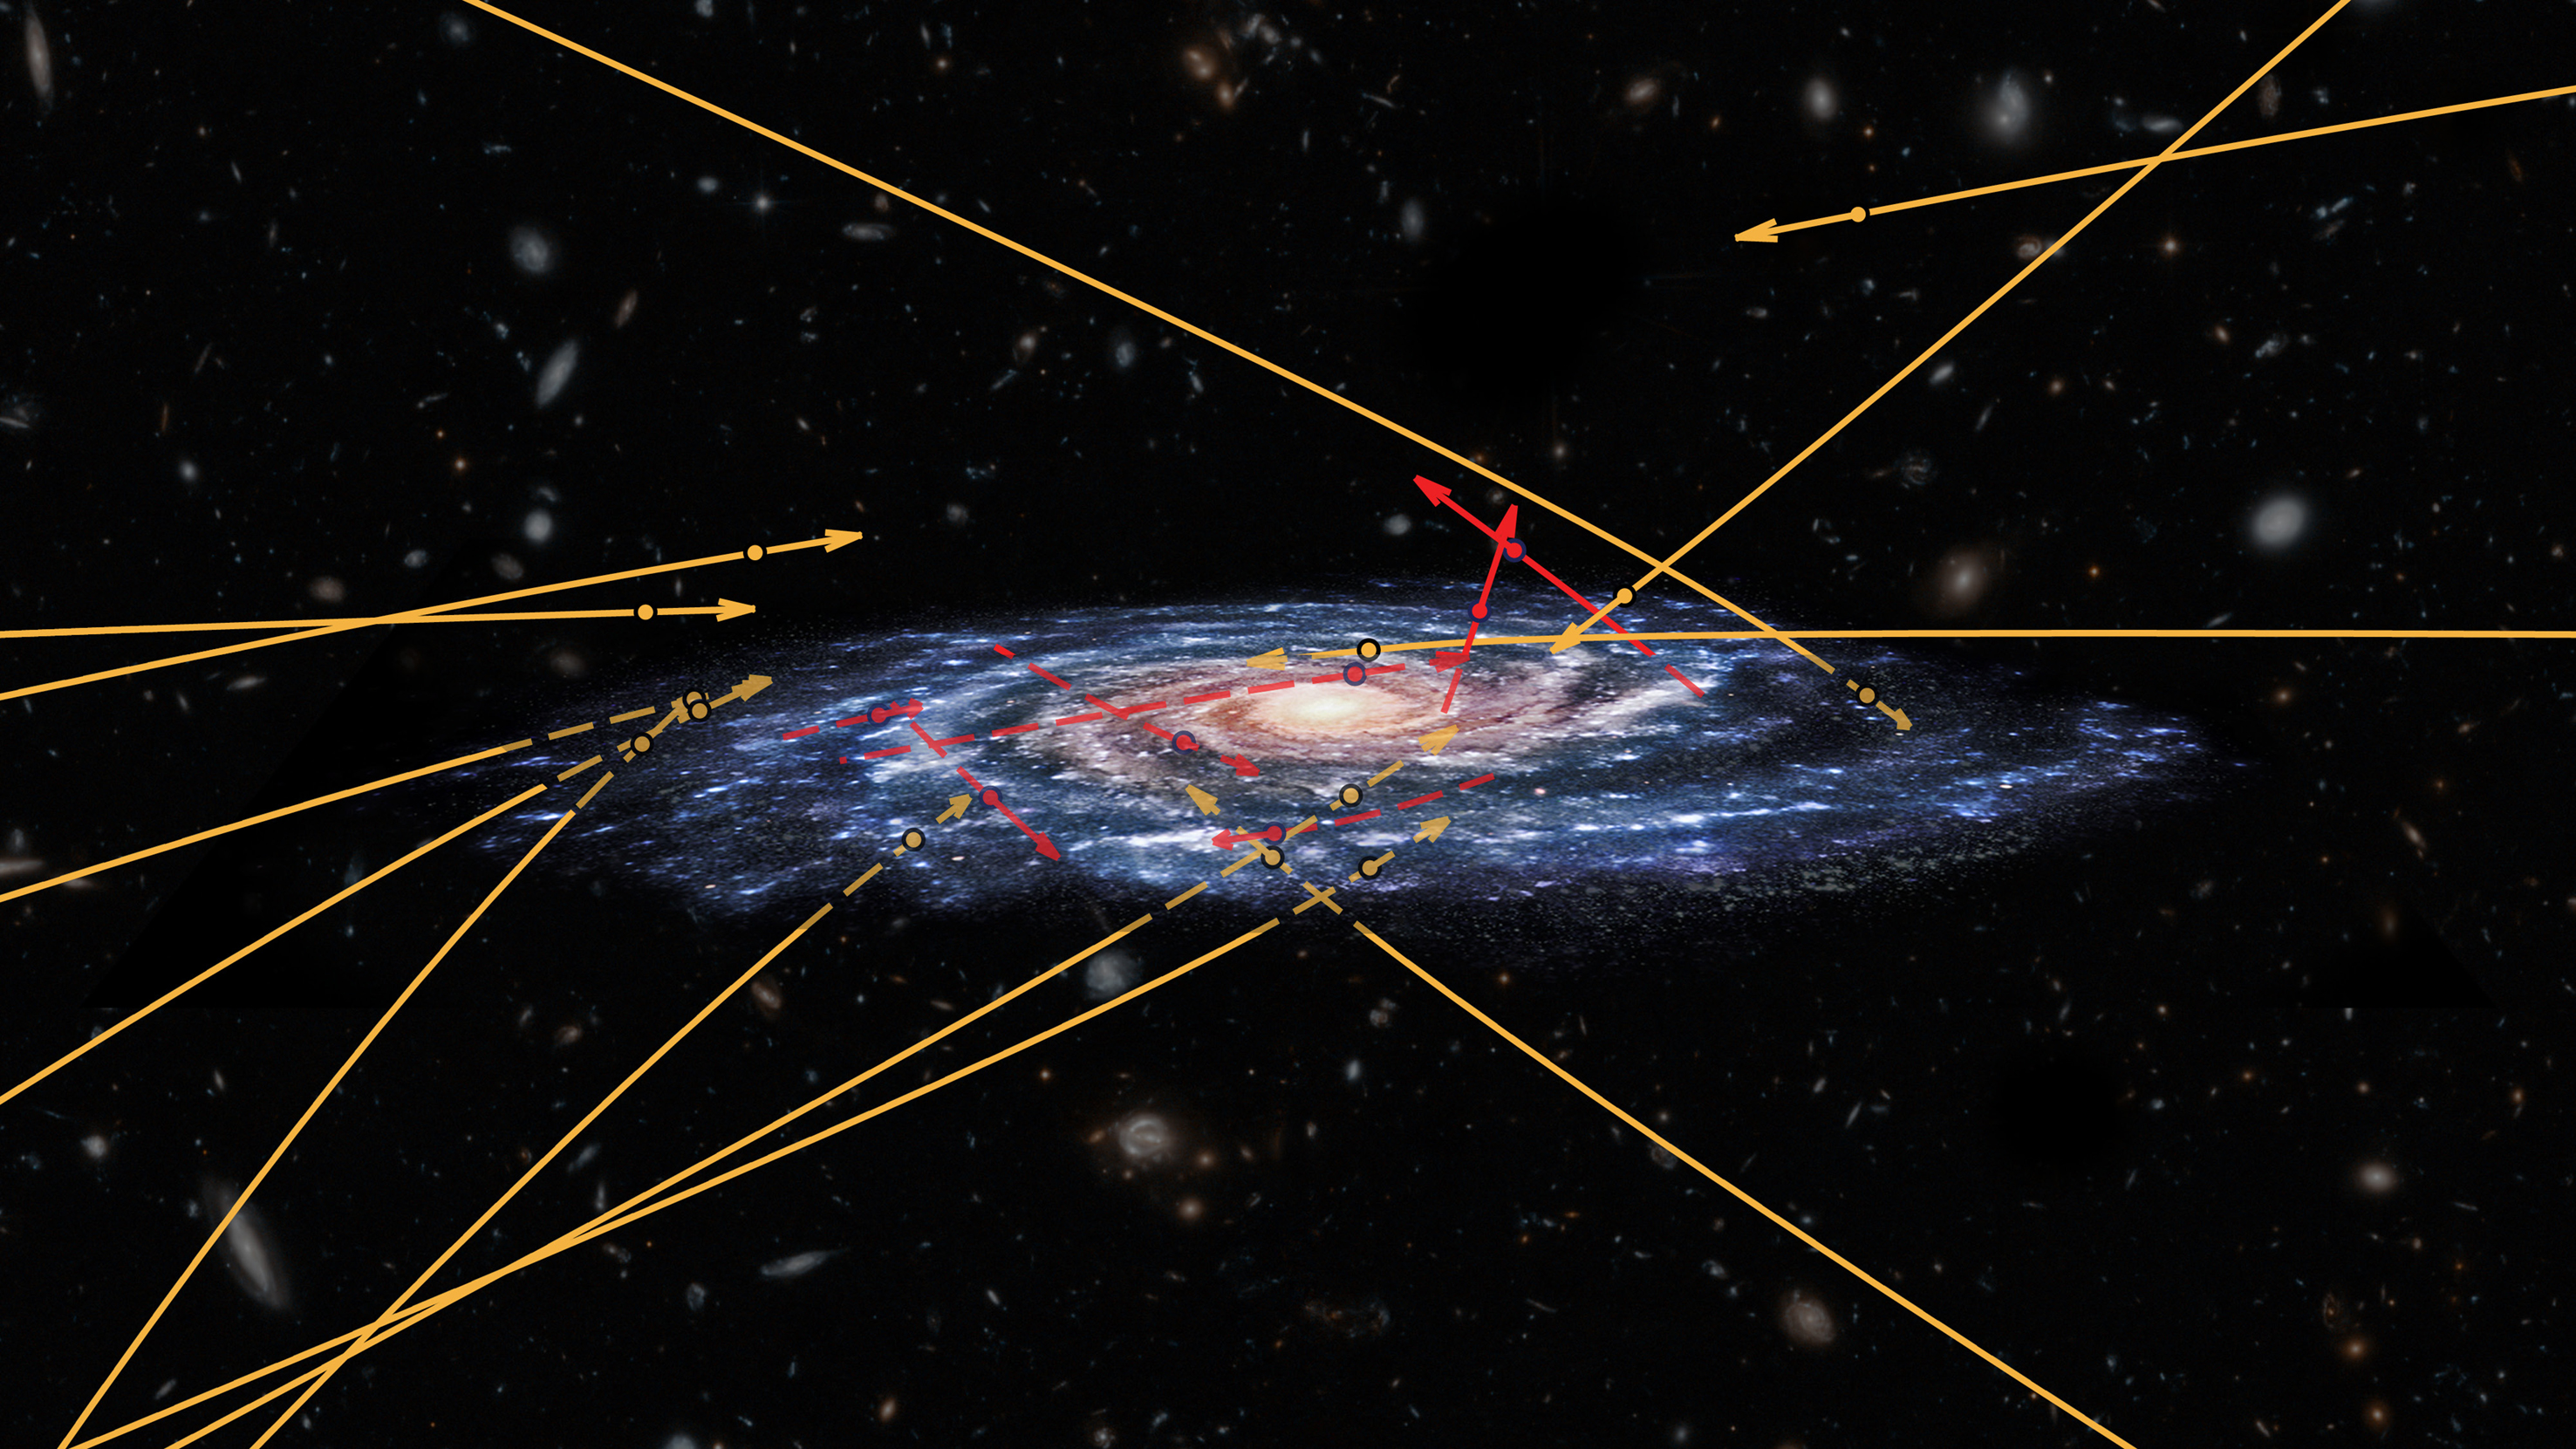 1567213850901-ESA_Gaia_Sprinting_Stars_3k.jpg